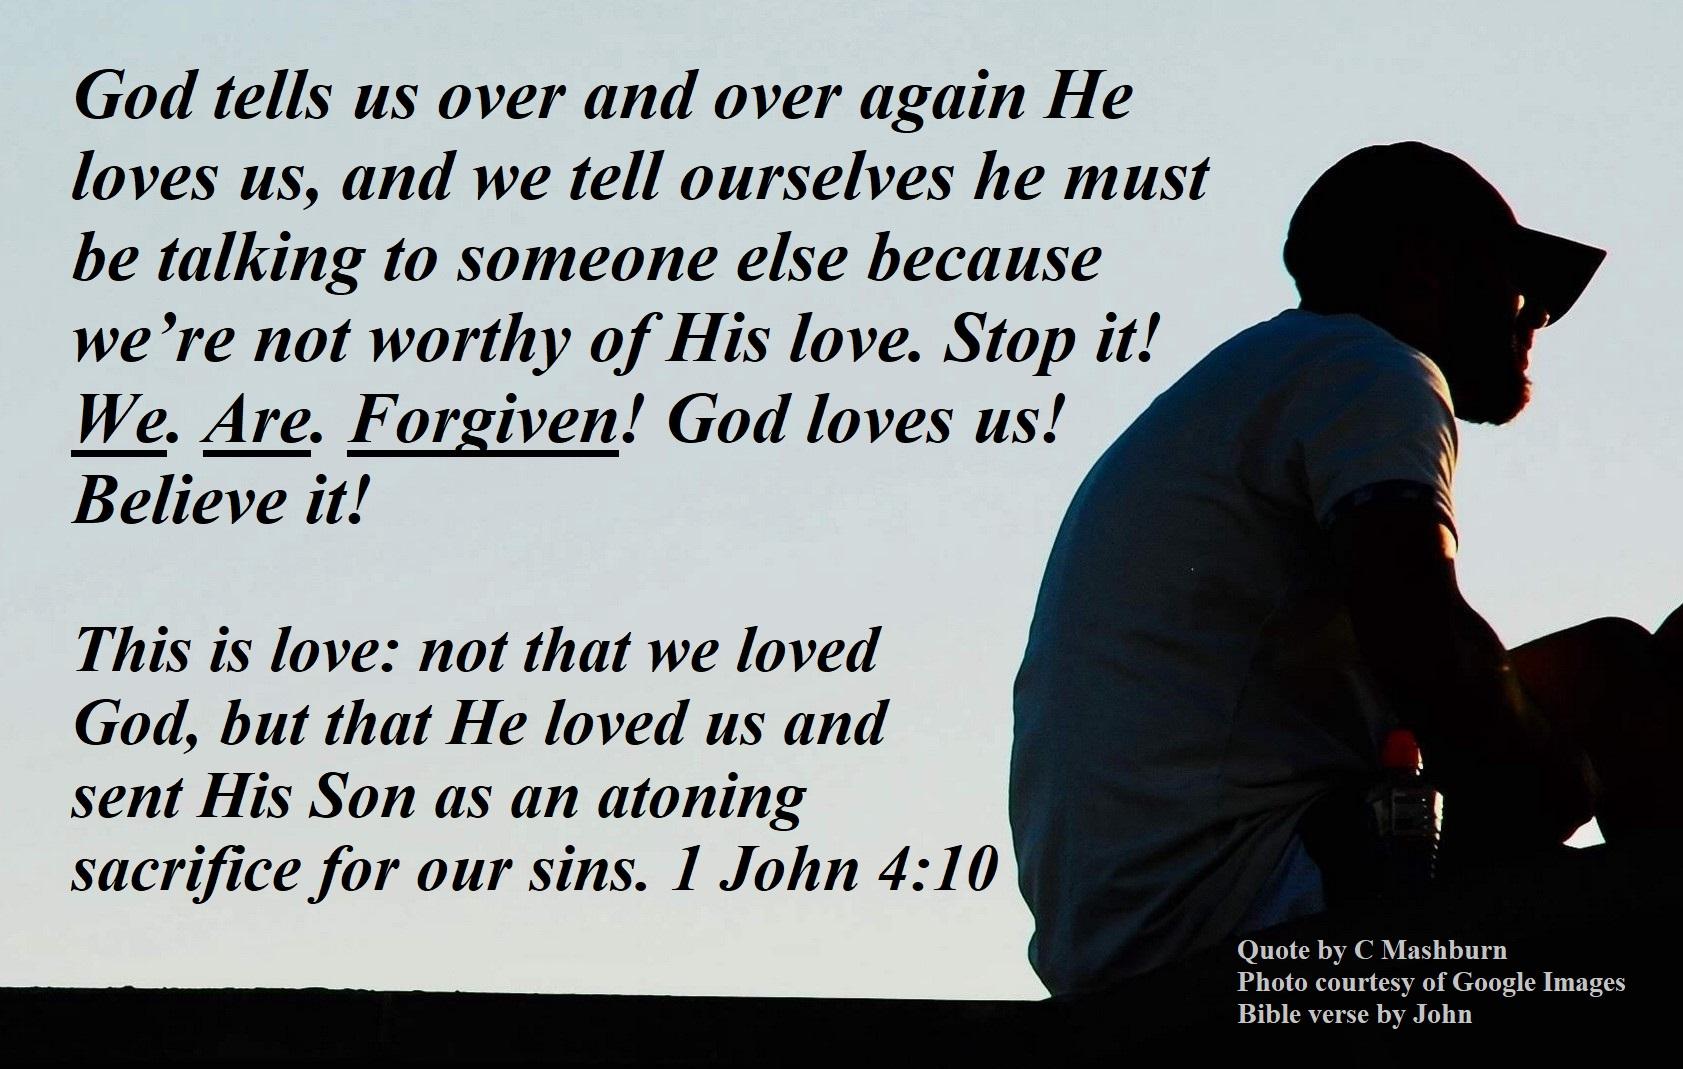 a man - forgiven